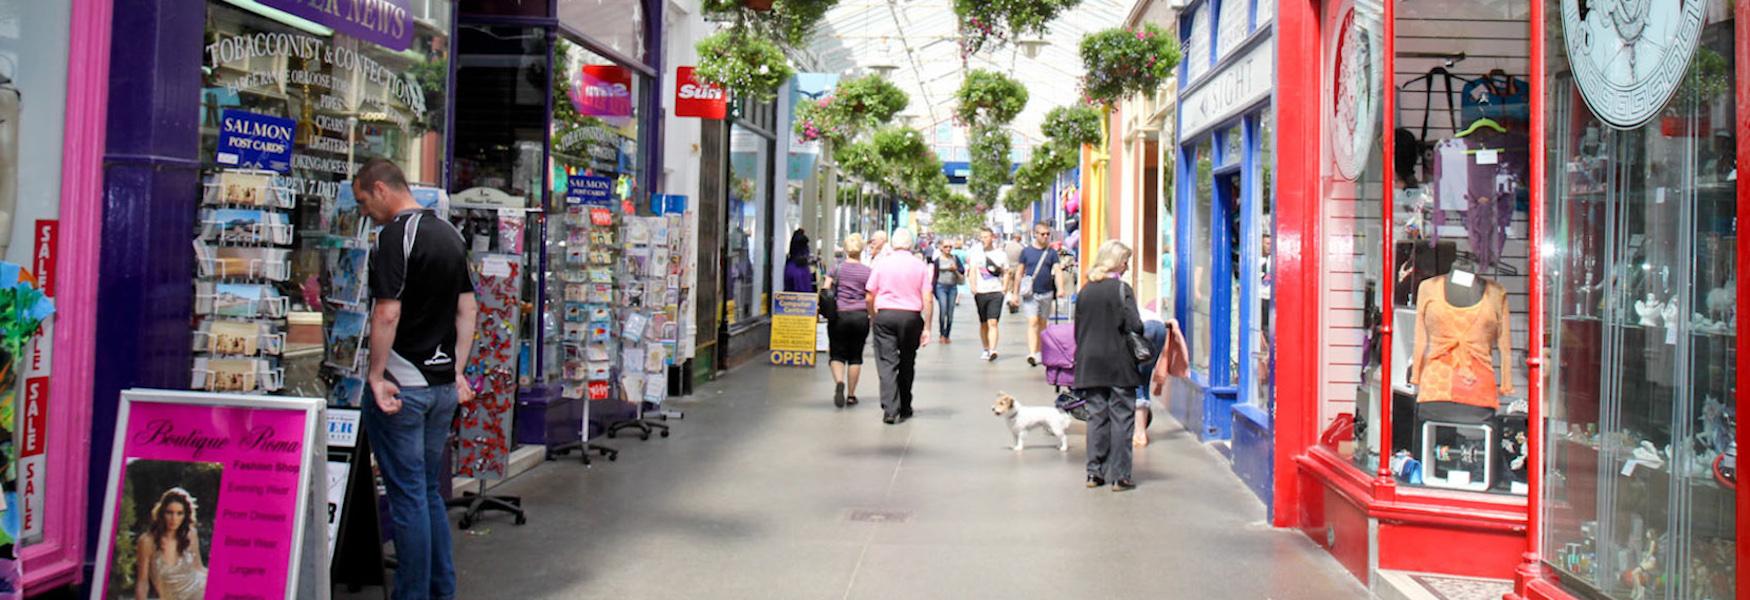 The Bognor Regis Shopping Arcade